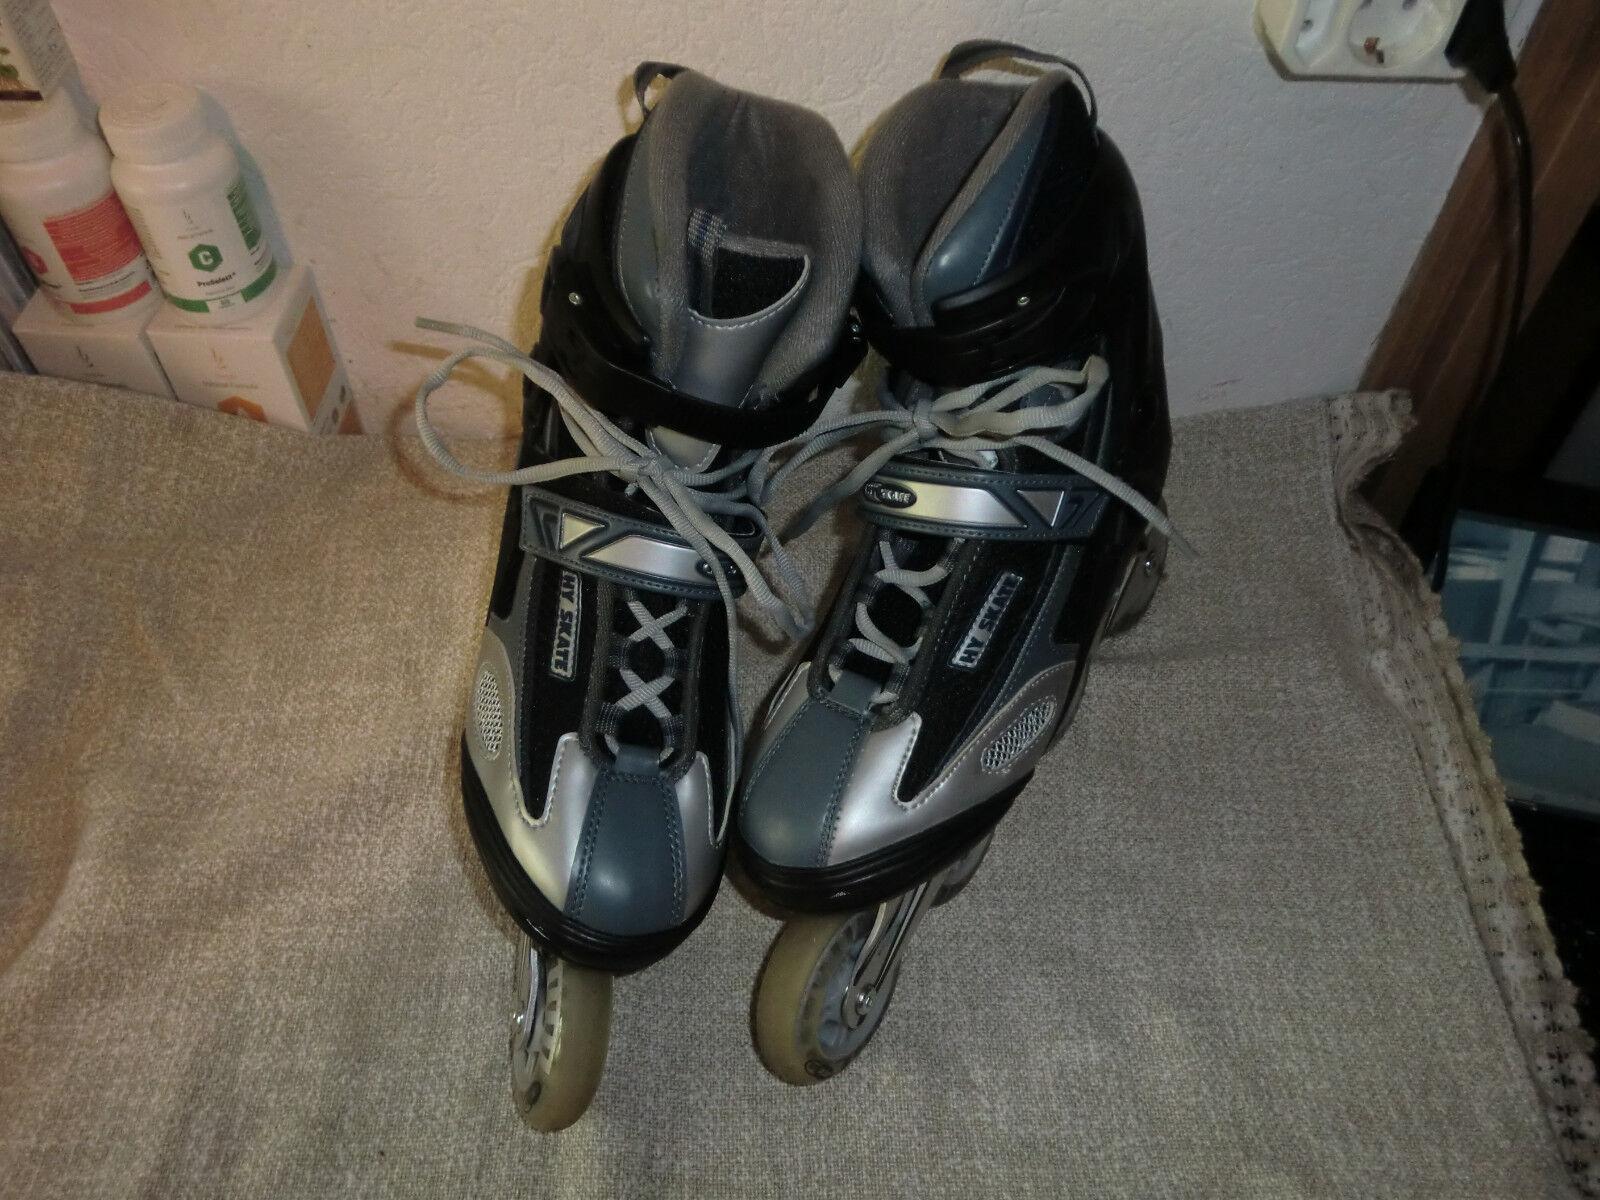 Rollerskates Rollschuhe Inliner HY-SKATE Alu ABEC-7, Gr 42, 26,5 cm, nwtg  (42)